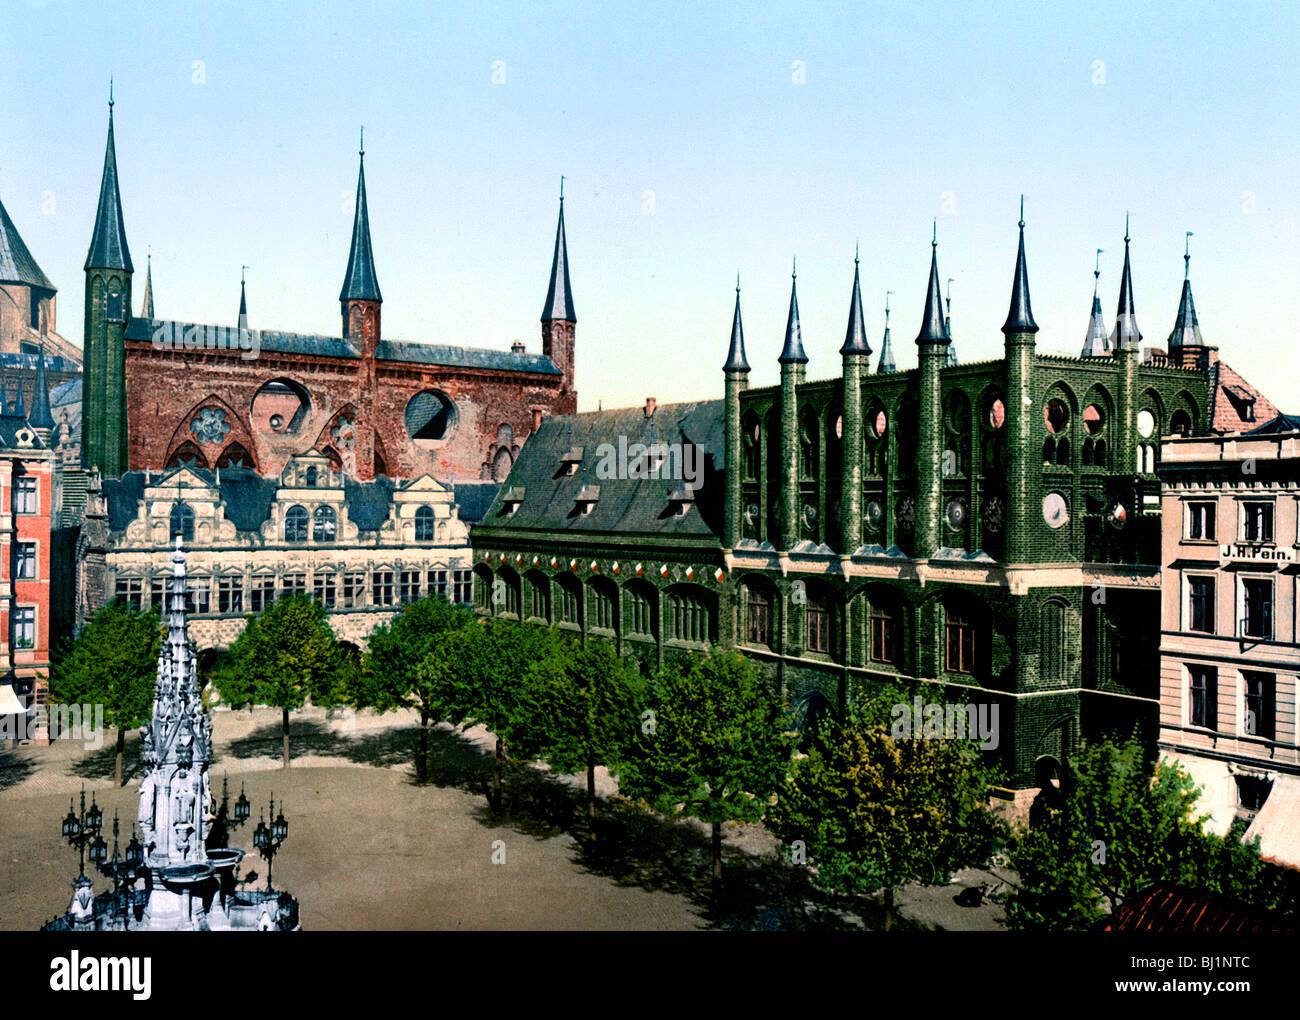 Marktplatz Lübeck Immagini Stock